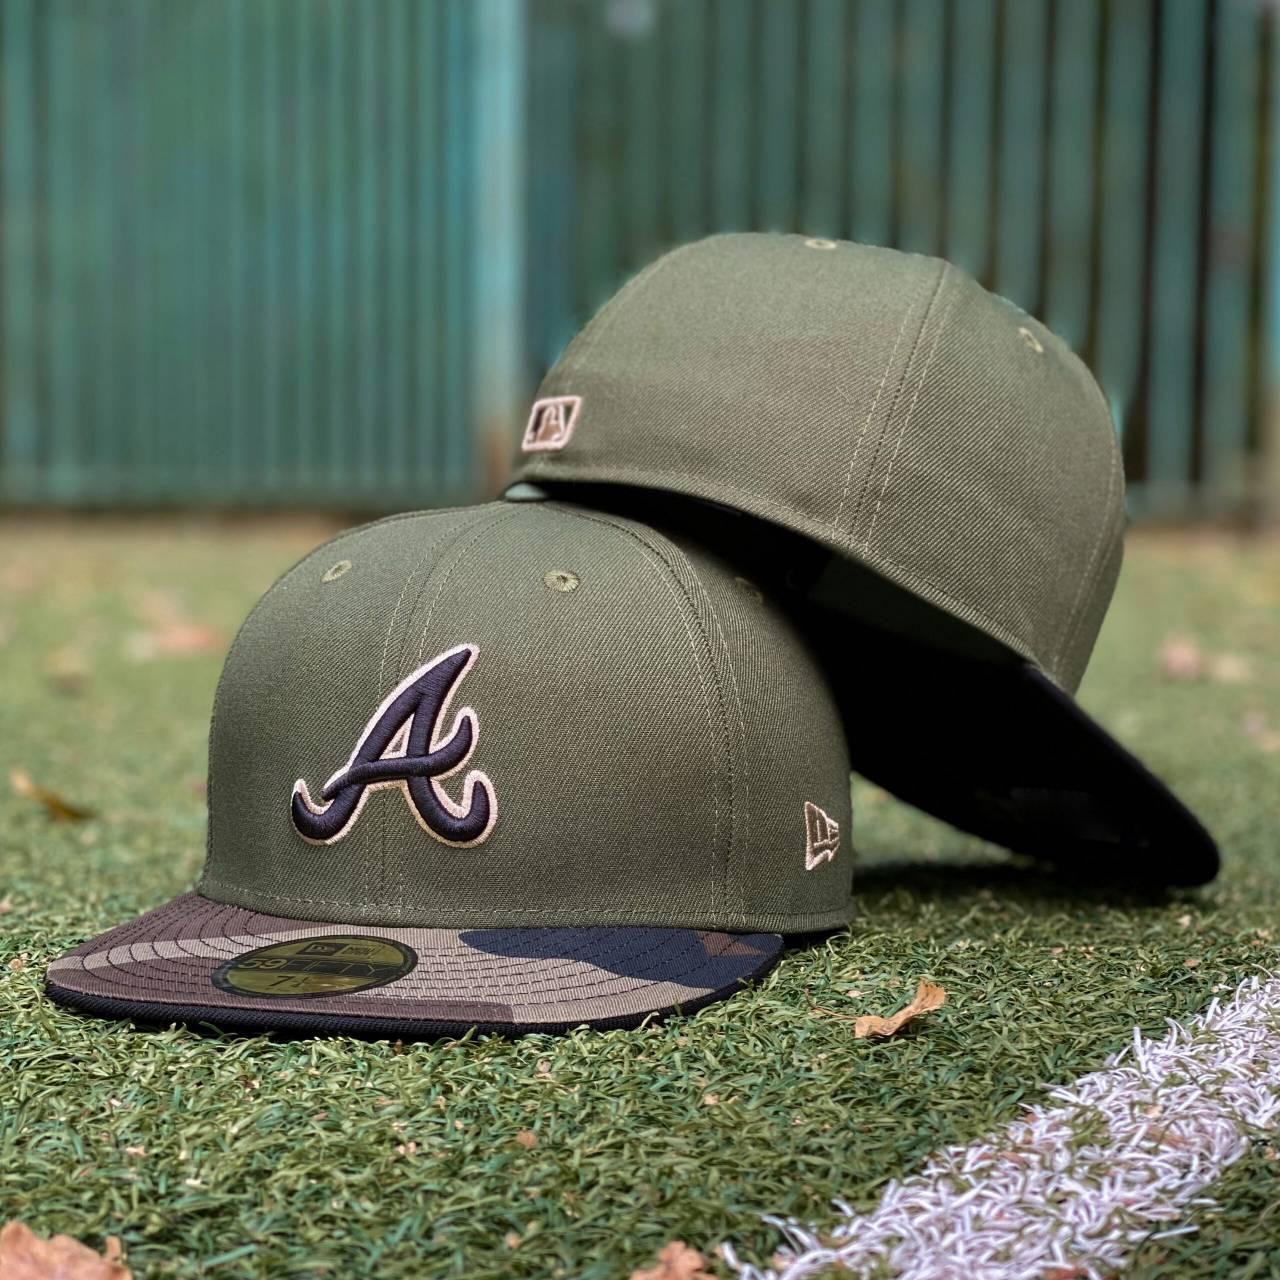 EXCLUSIVE 59FIFTY MLB ATLANTA BRAVES ARMY GREEN/CAMO VISOR